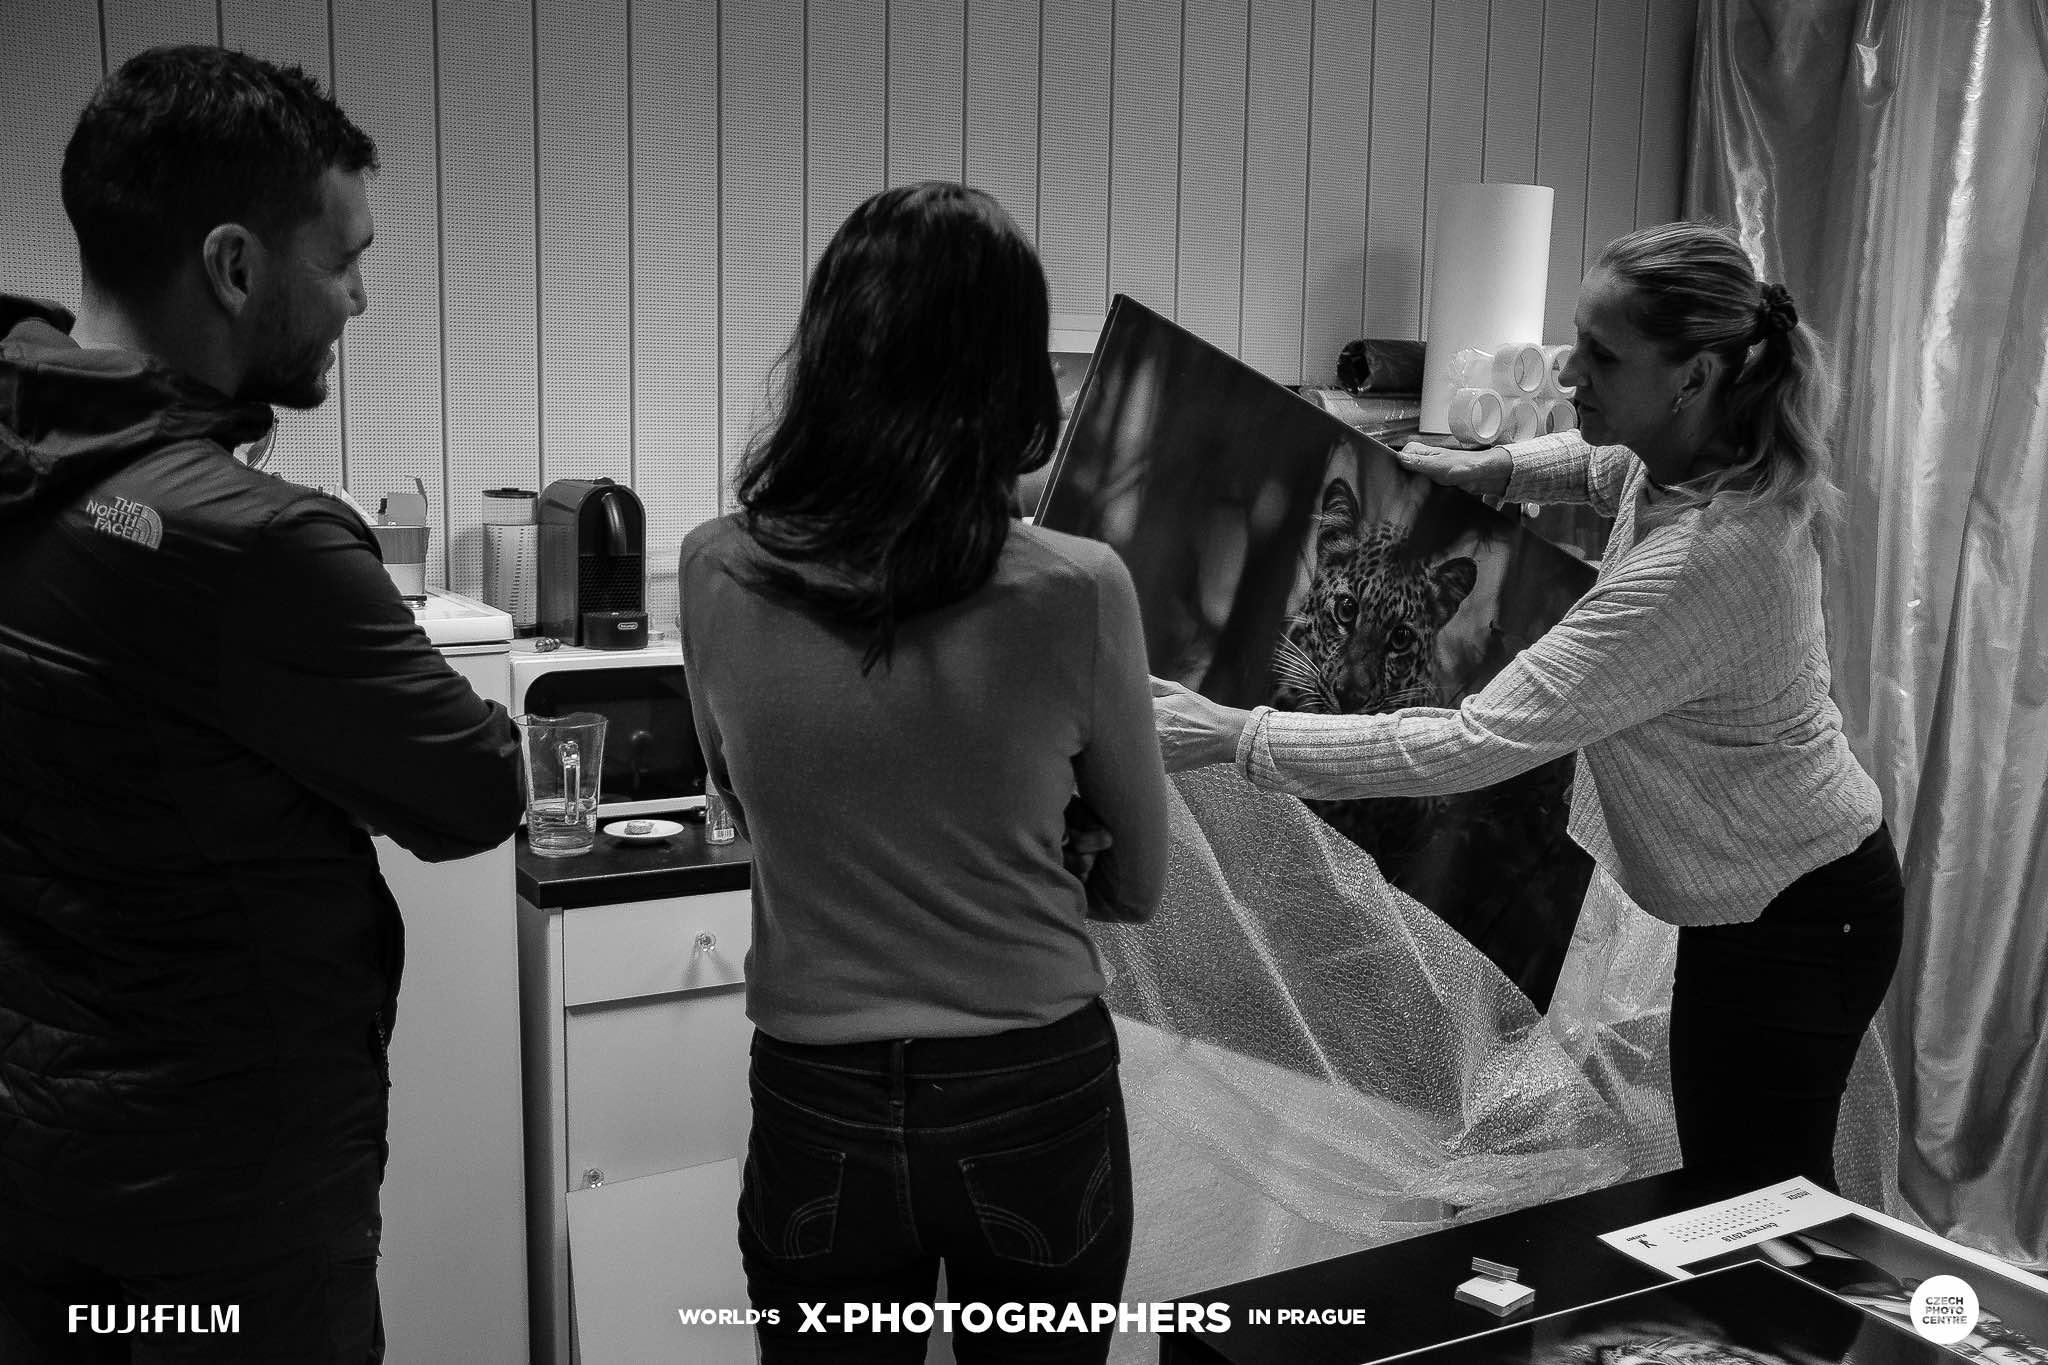 FujiFlex Crystal Archive Czech Photo Center Riegl Photolaboratory WORLD FUJIFILM X-Photographer Prague printing photography